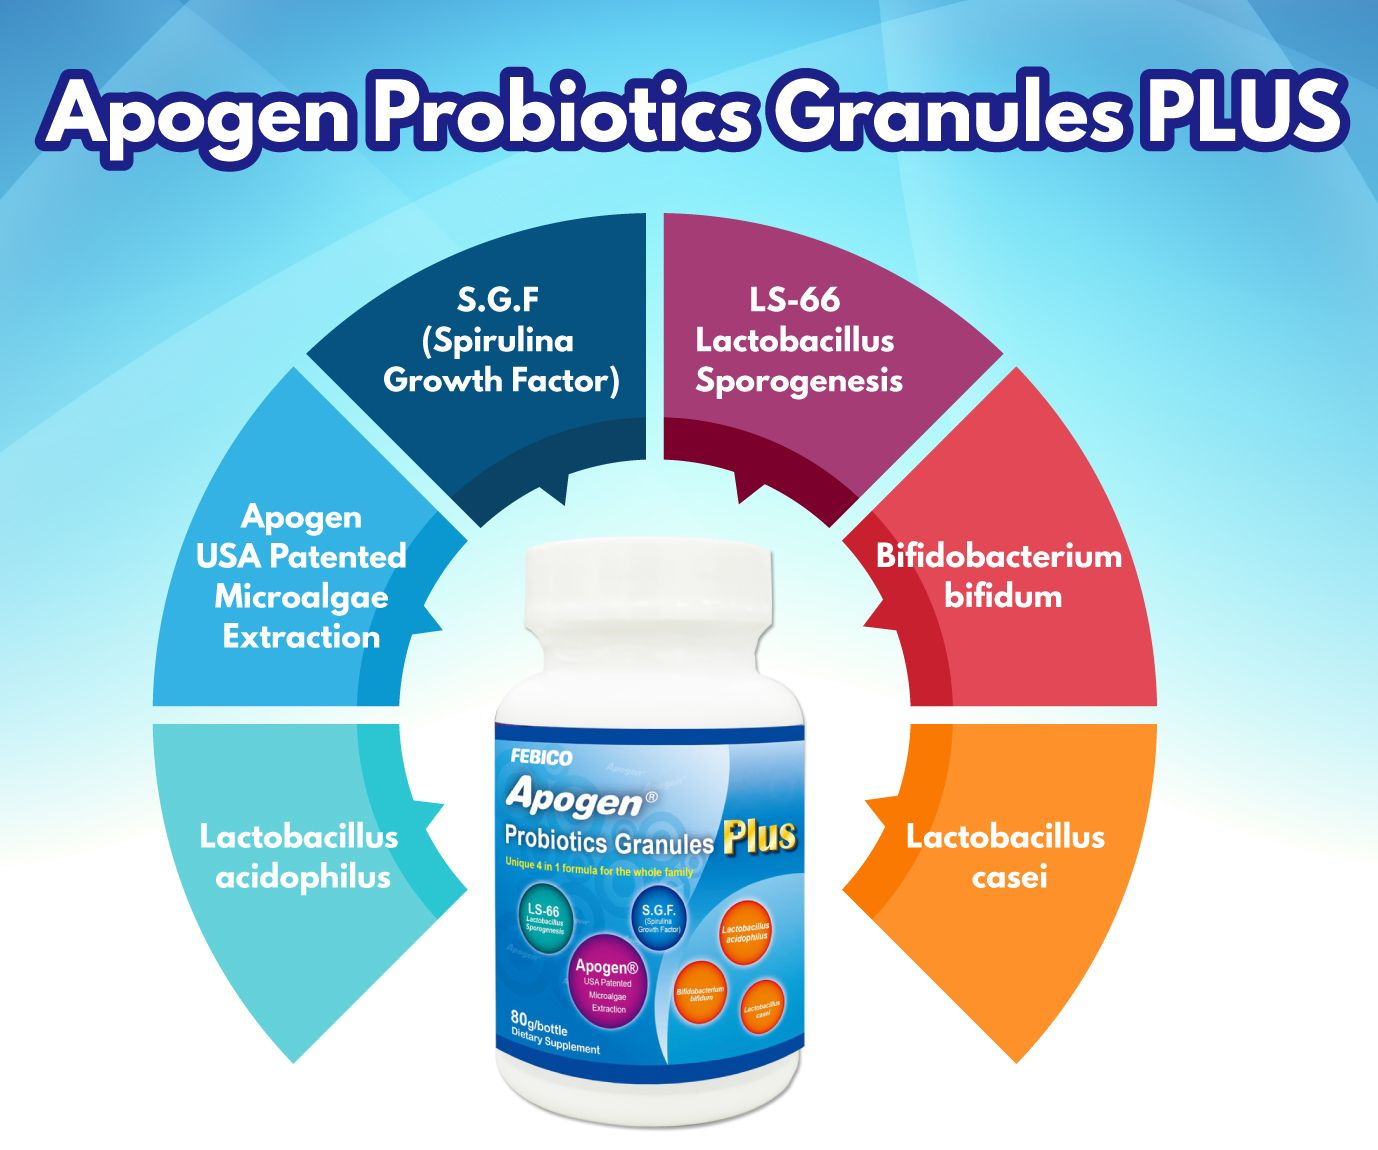 Apogen® Lactobacillus Sporogenes Probiotici Più - Apogen Probiotici Lista degli ingredienti